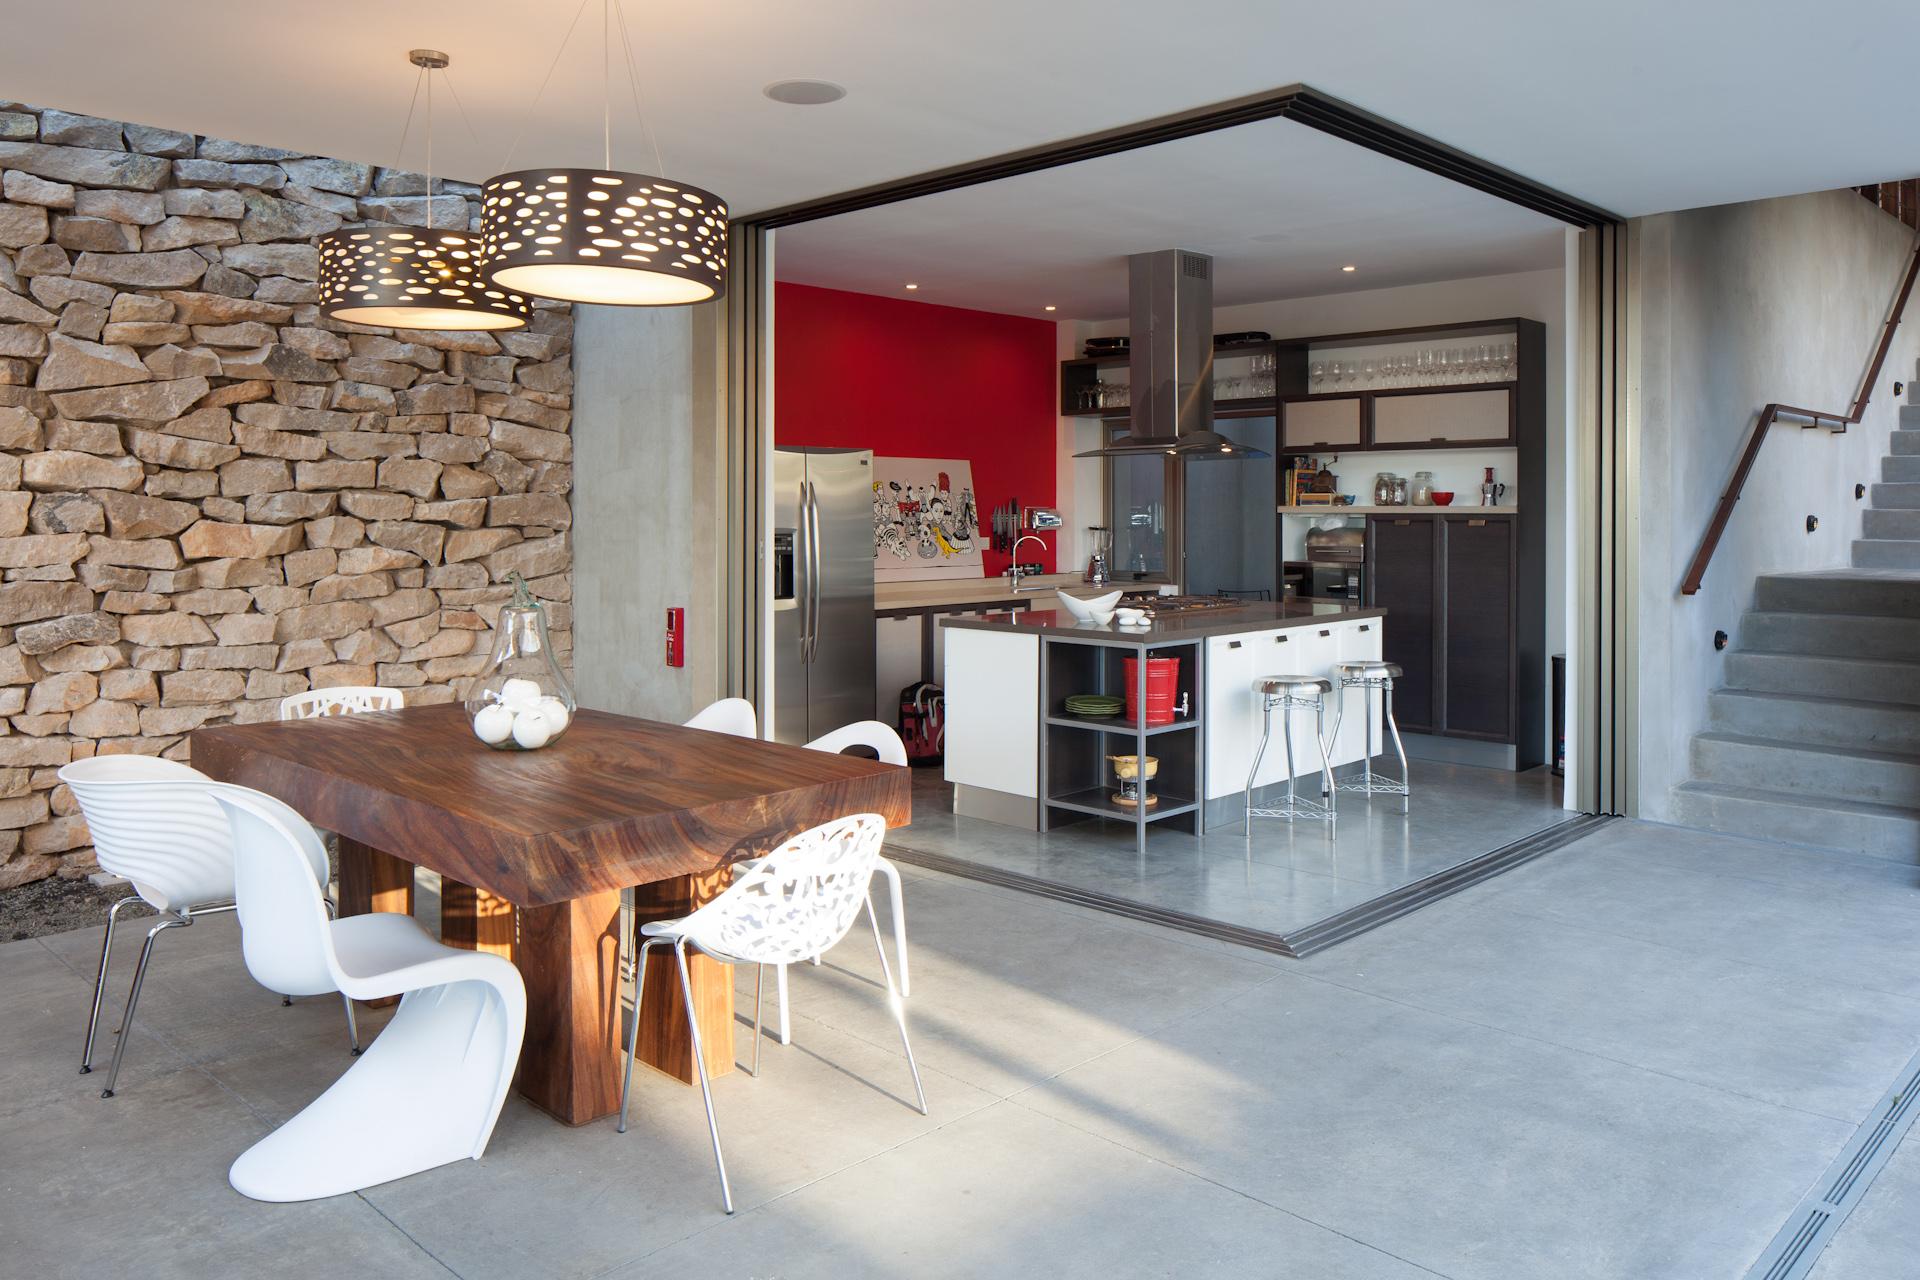 Architecture-Modern-Casa-Jardin-El-Salvador-Interior-09.JPG